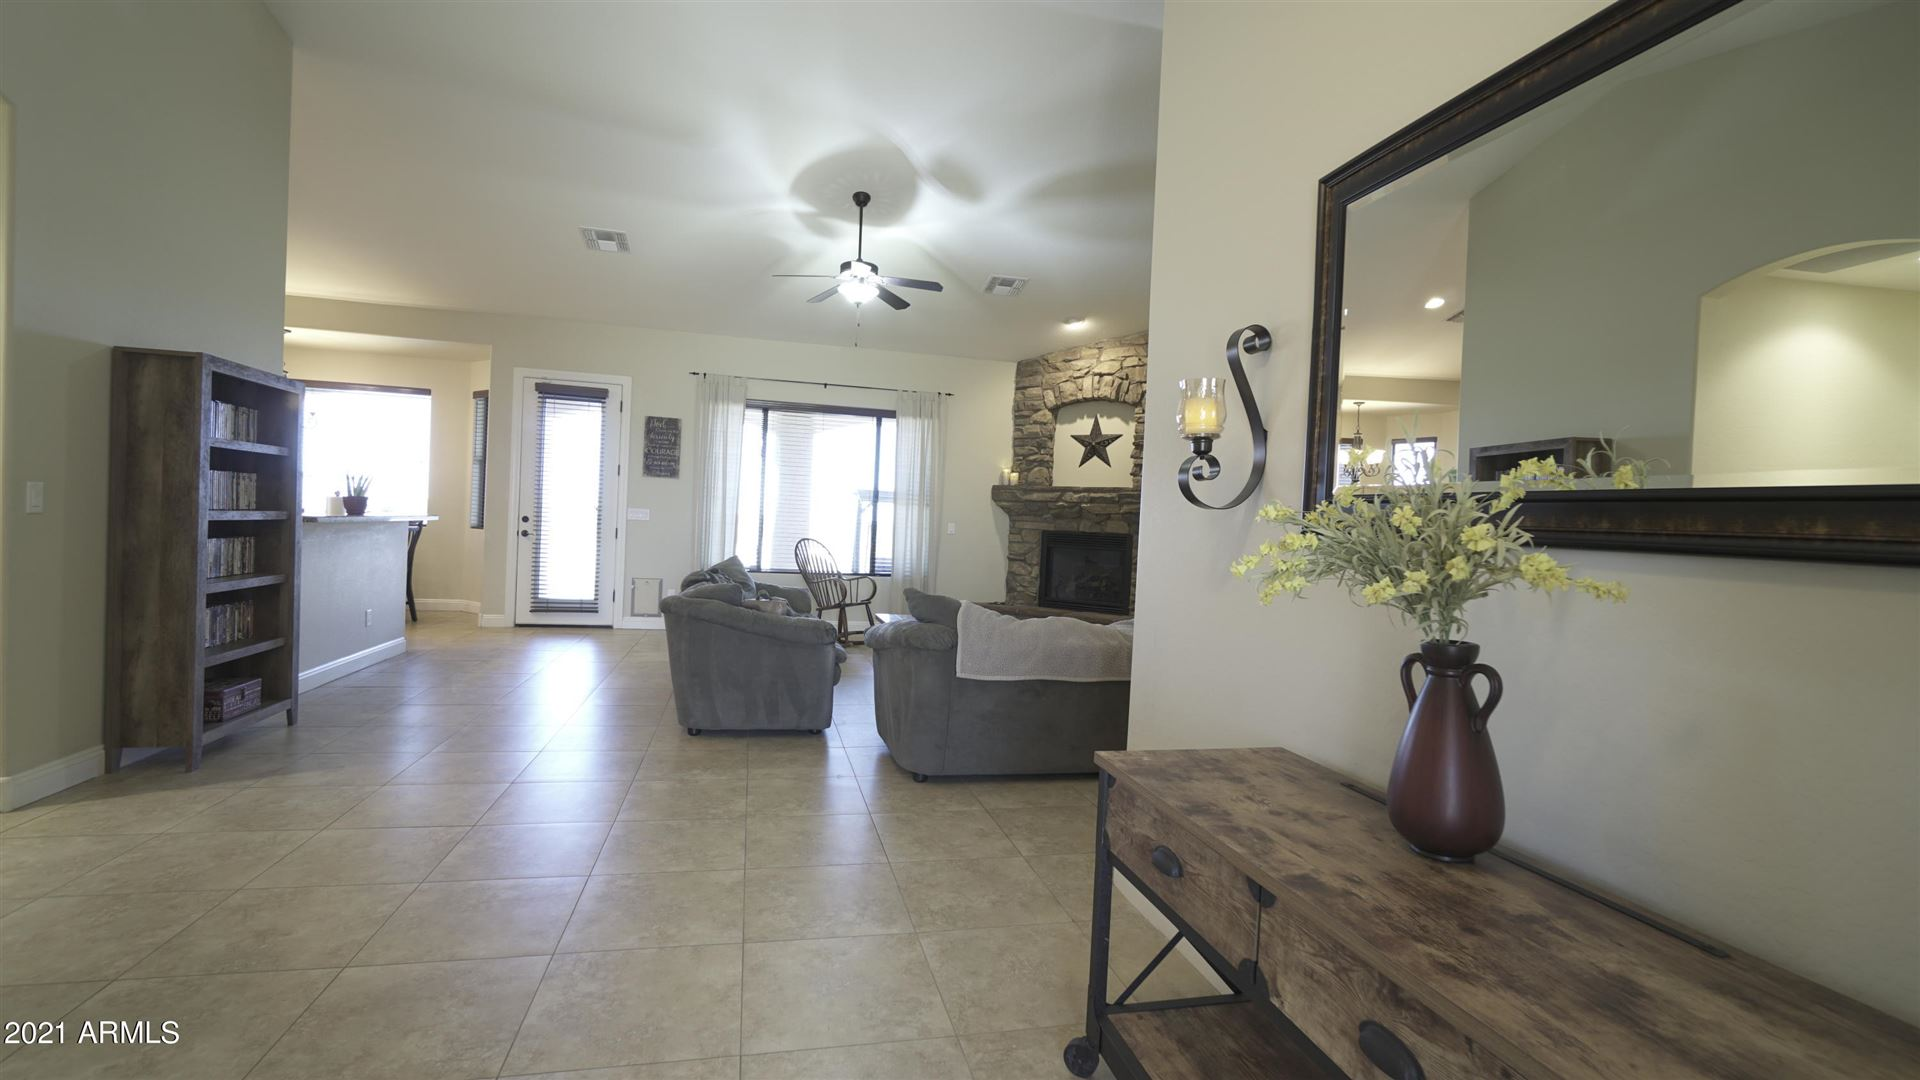 Photo of 29449 N ASHBROOK Lane, Queen Creek, AZ 85142 (MLS # 6202036)